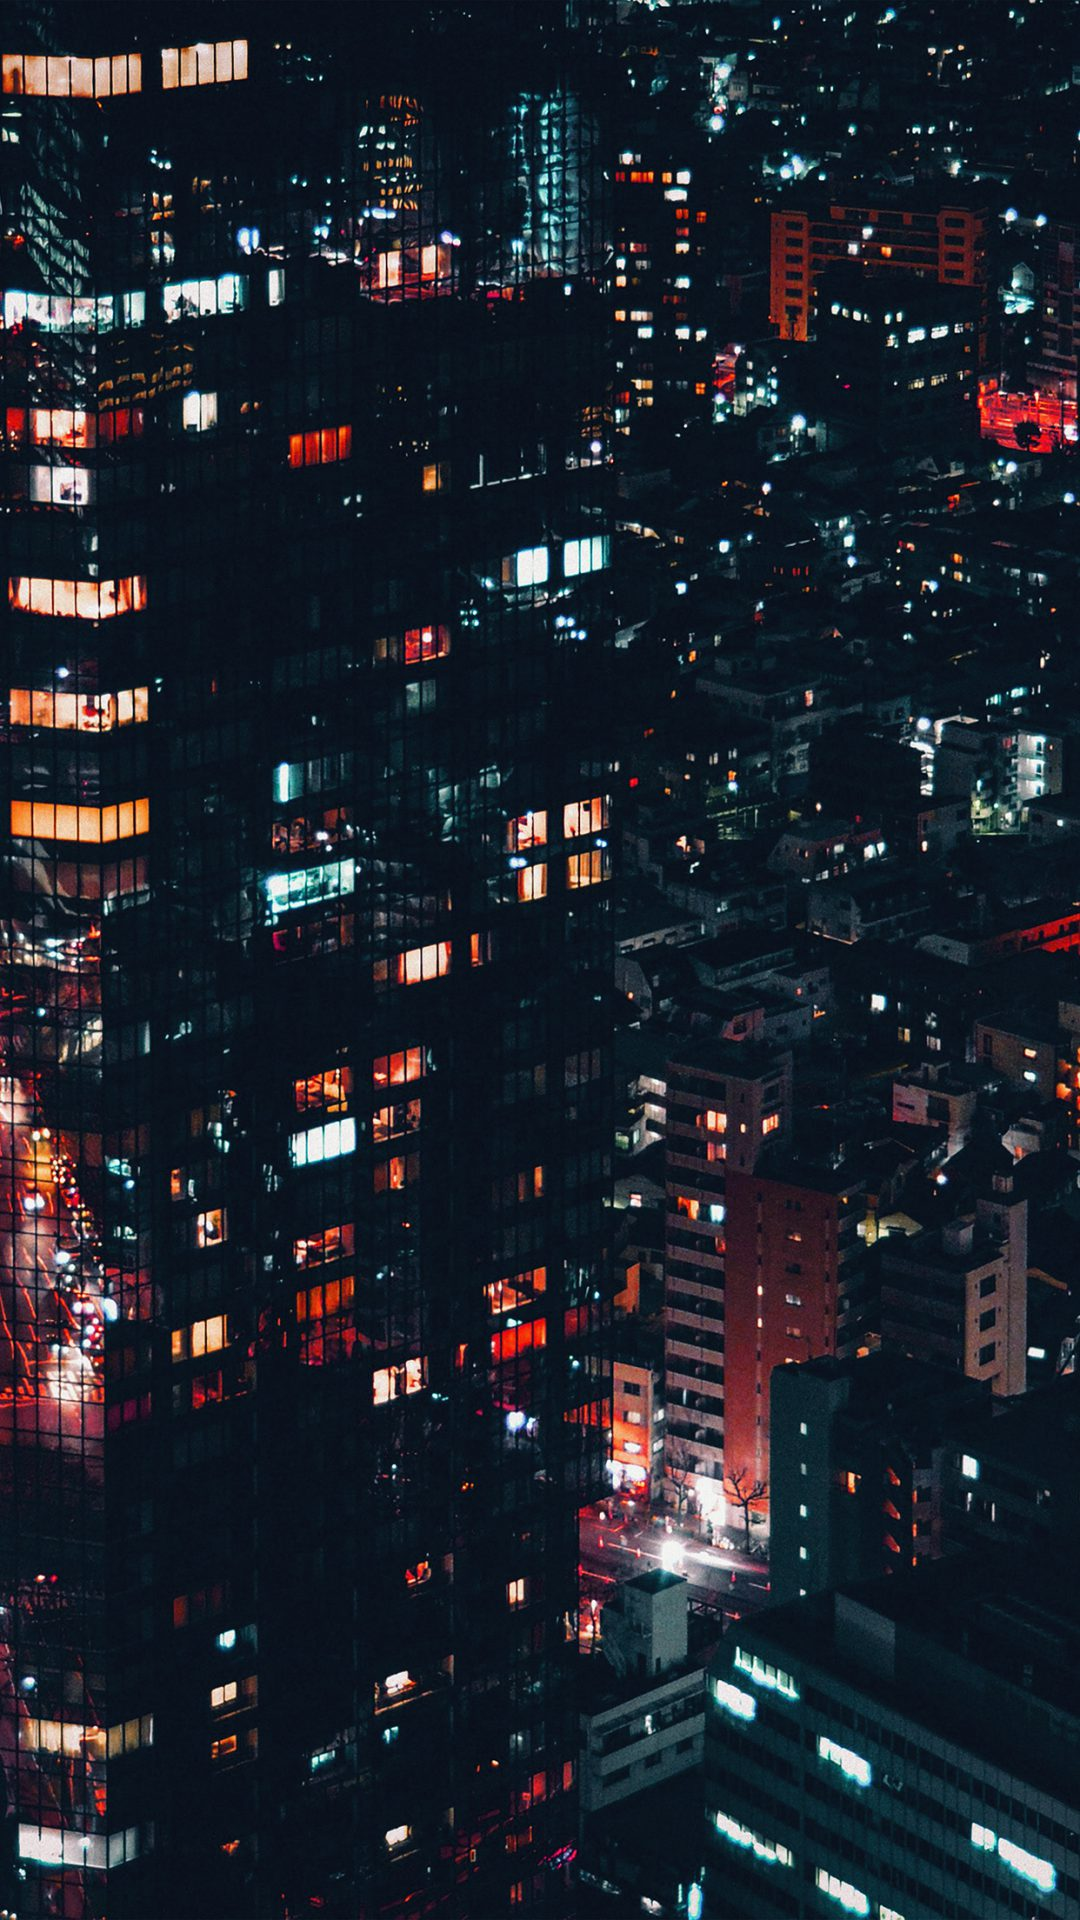 City Night Lights Building Pattern Red